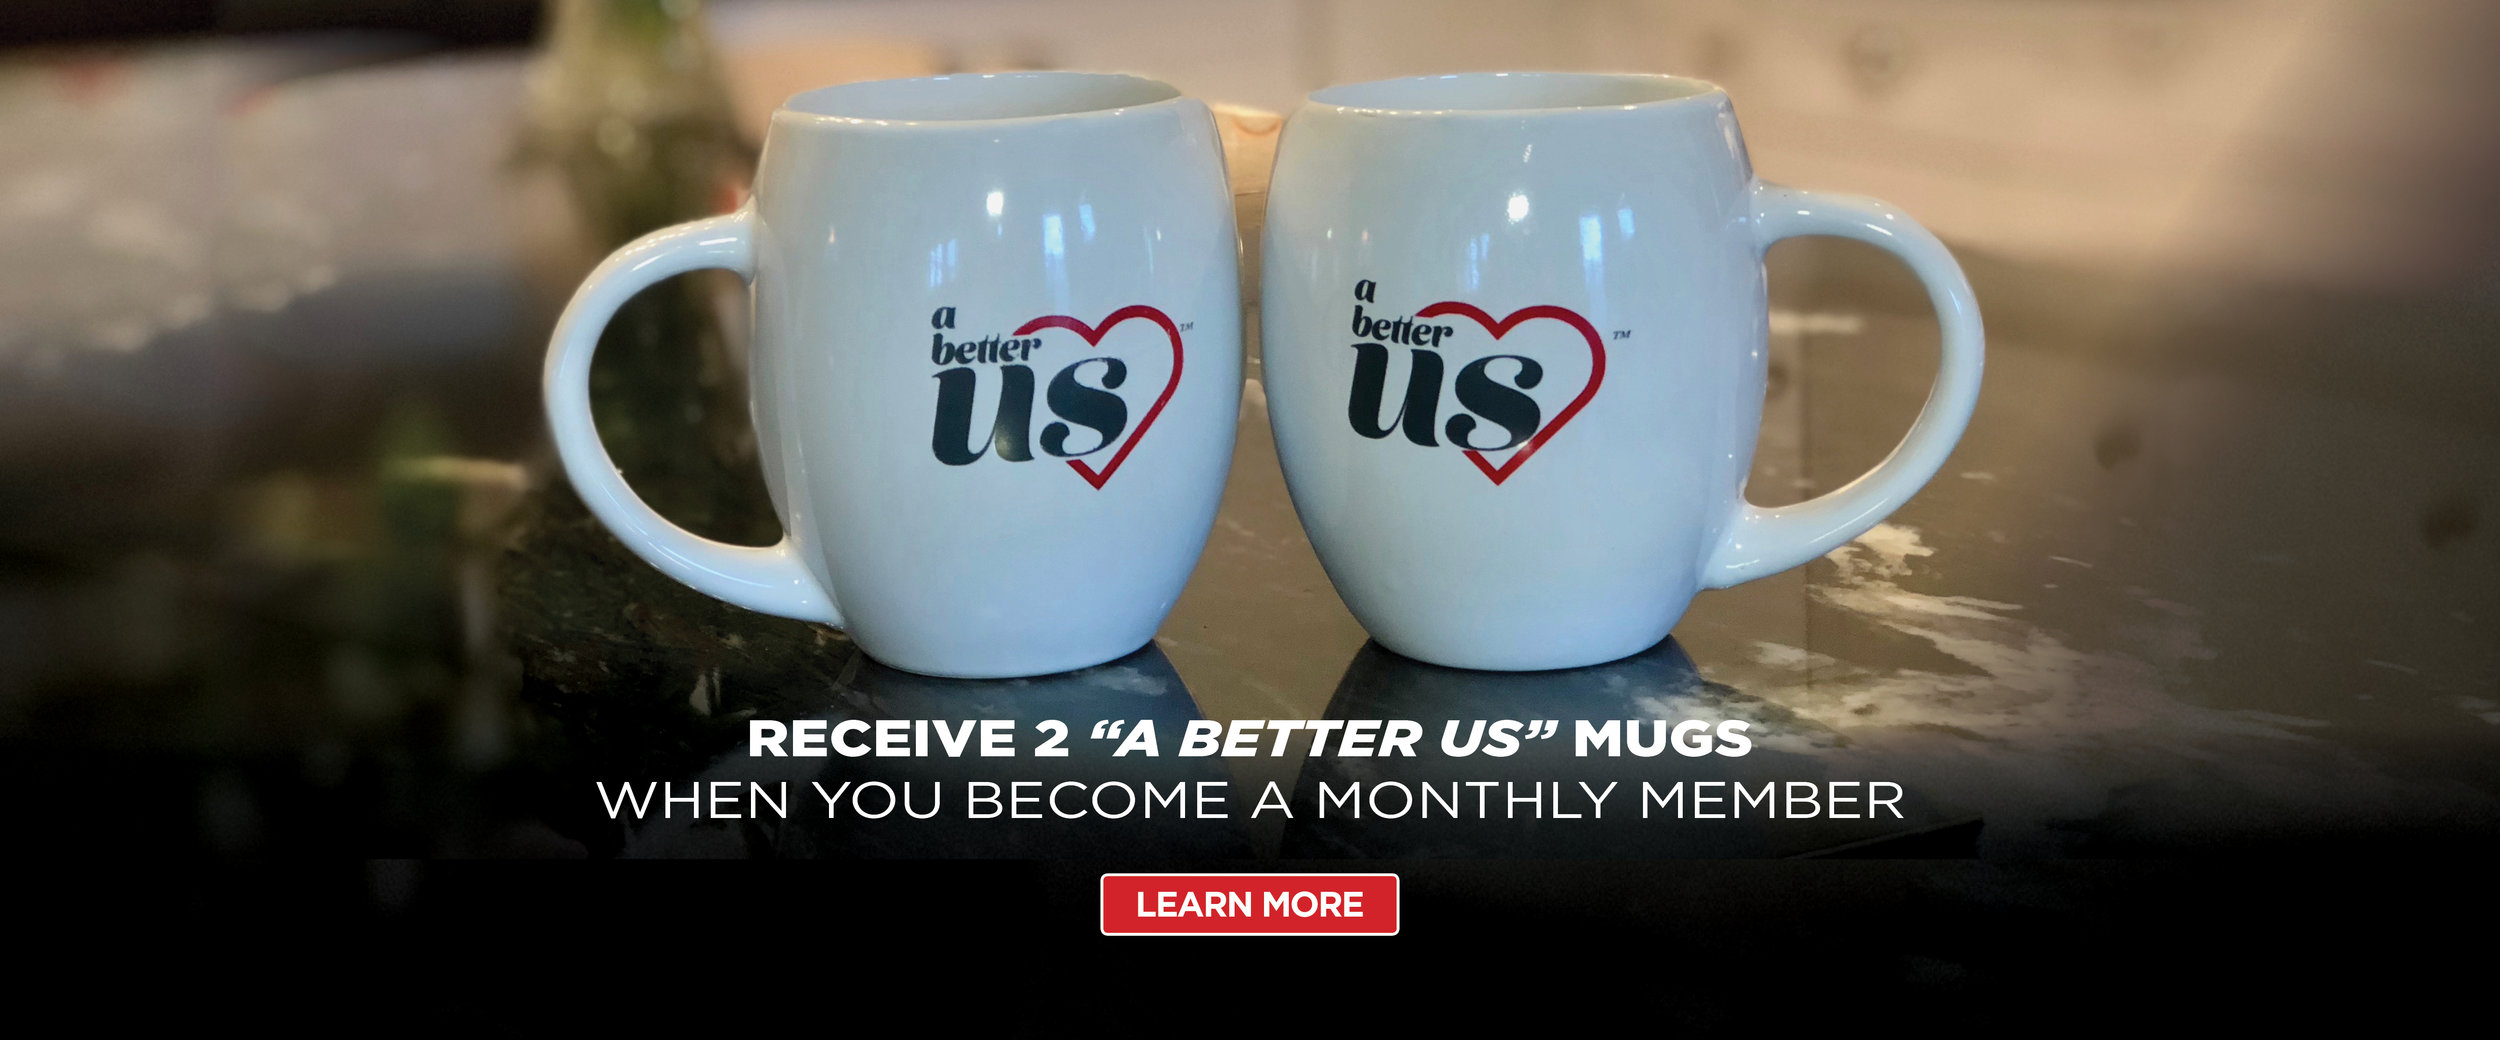 A-Better-Us-Web-Banner-Donate-Mug-Promo.jpg